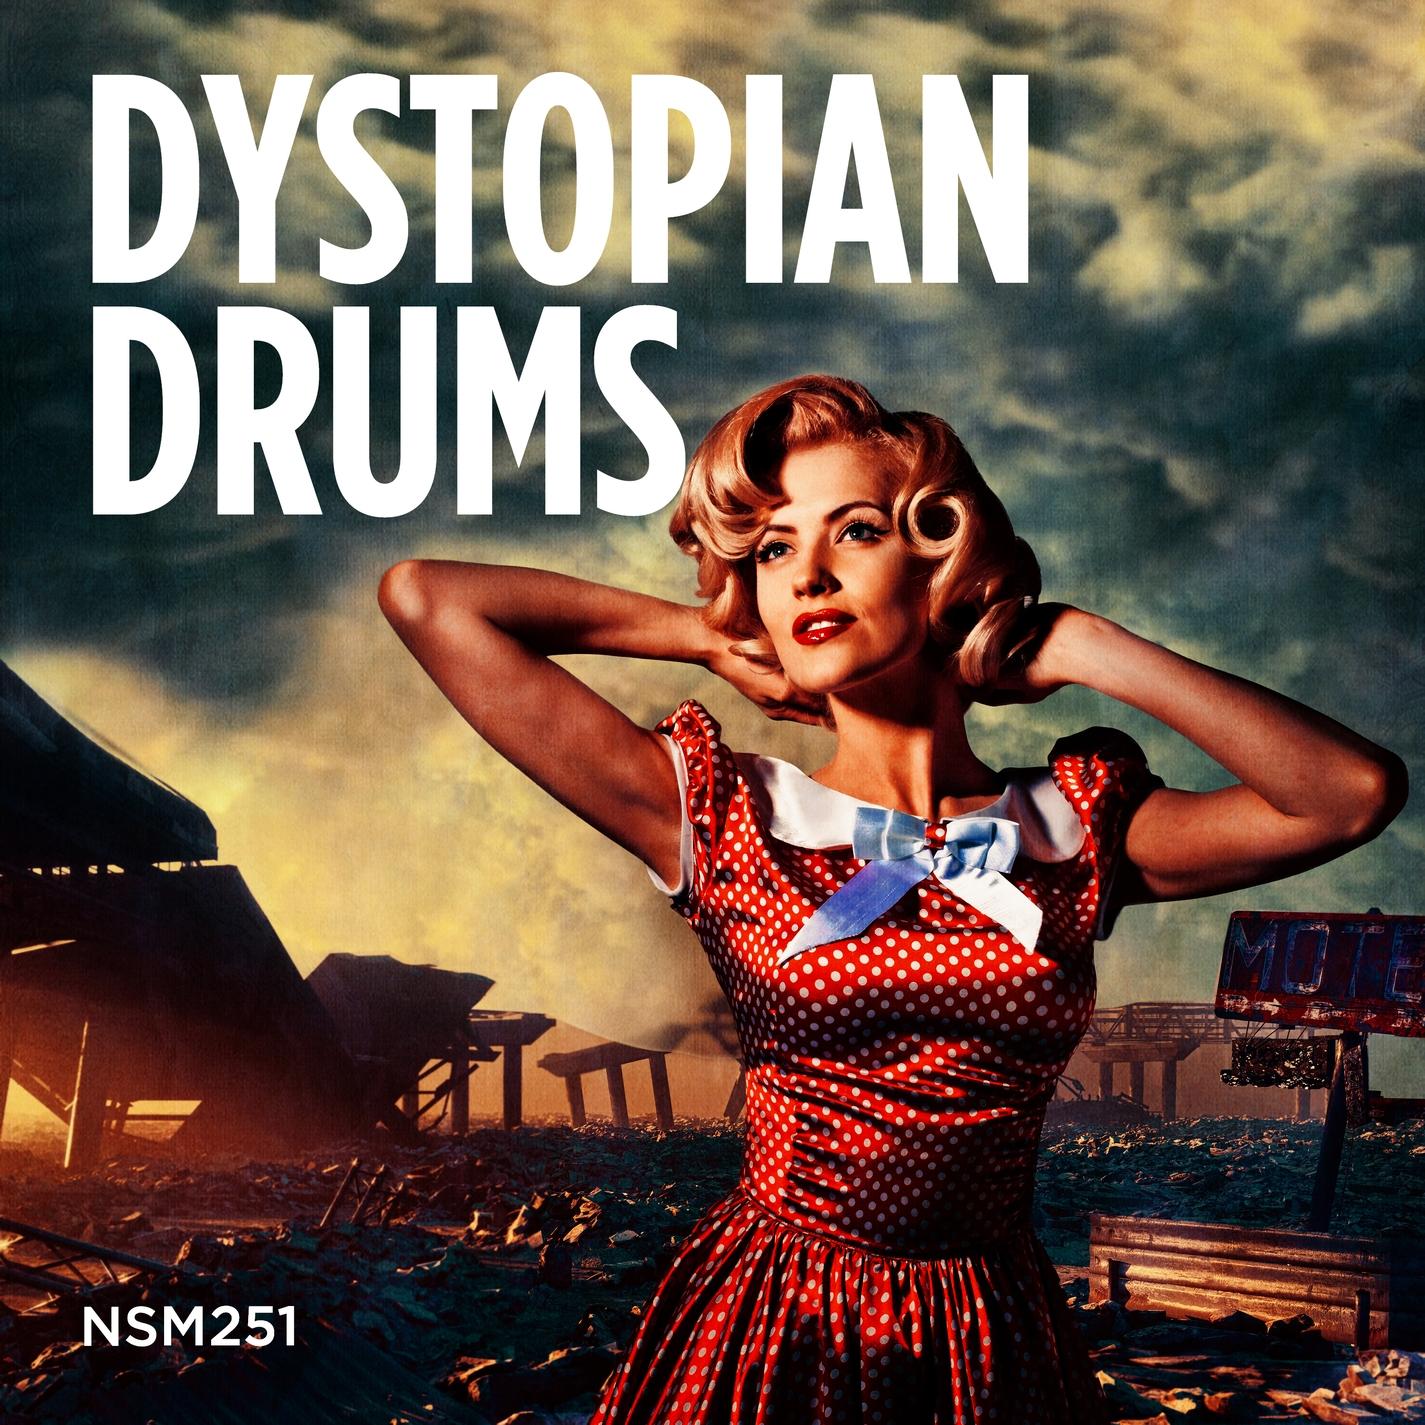 Dystopian Drums